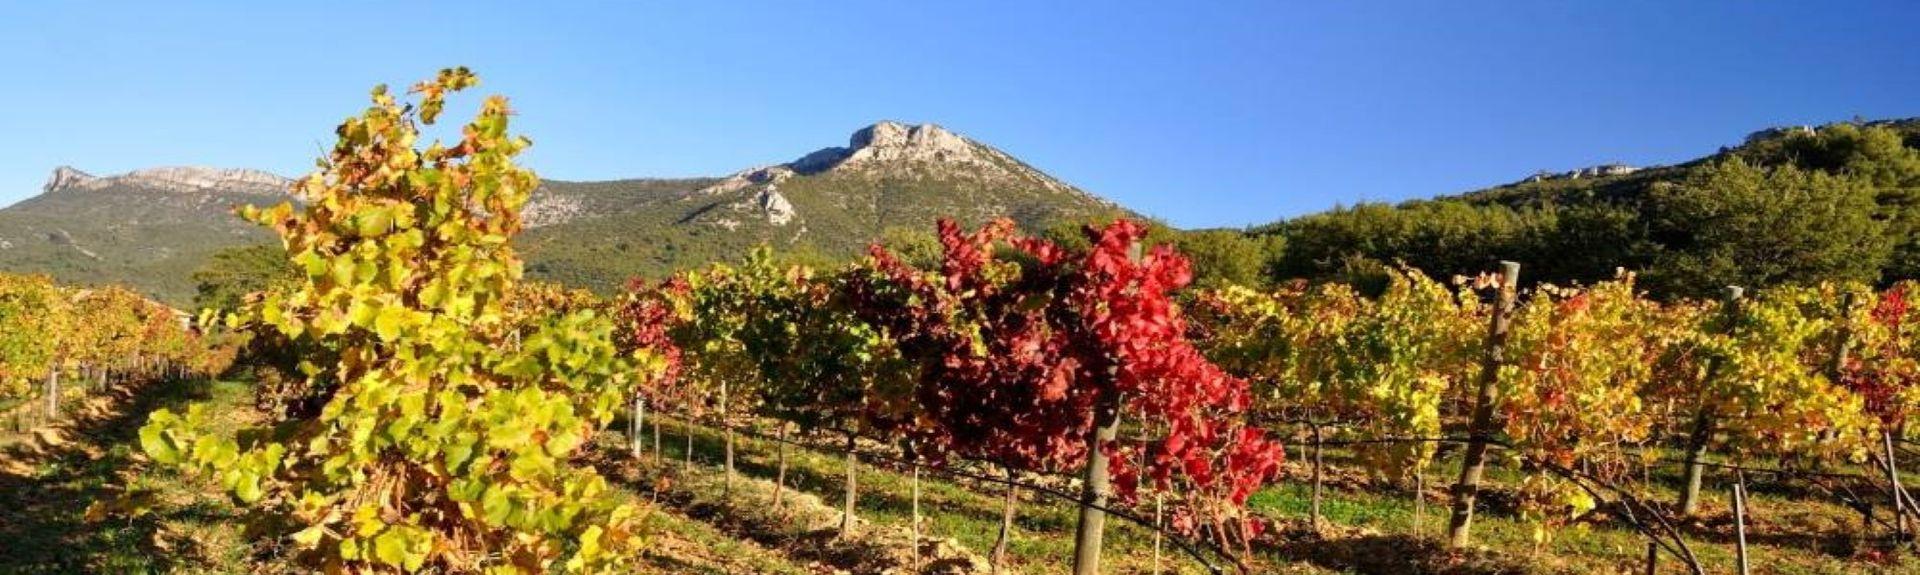 Peypin, Provence-Alpes-Côte d'Azur, França